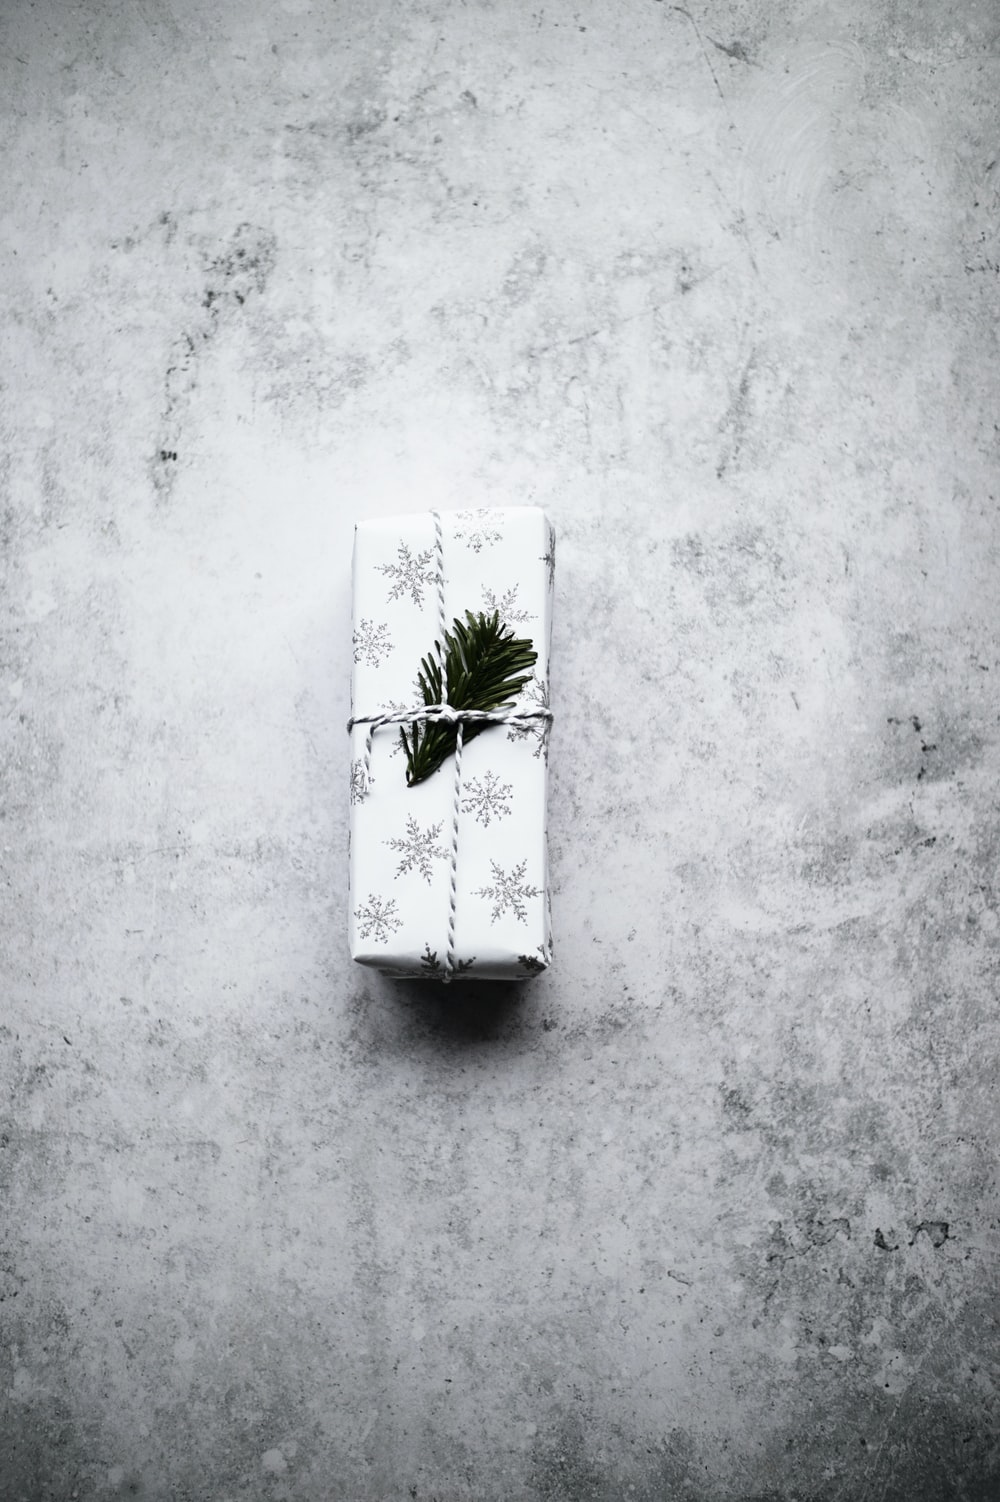 white and black snowflake print gift box on gray surface